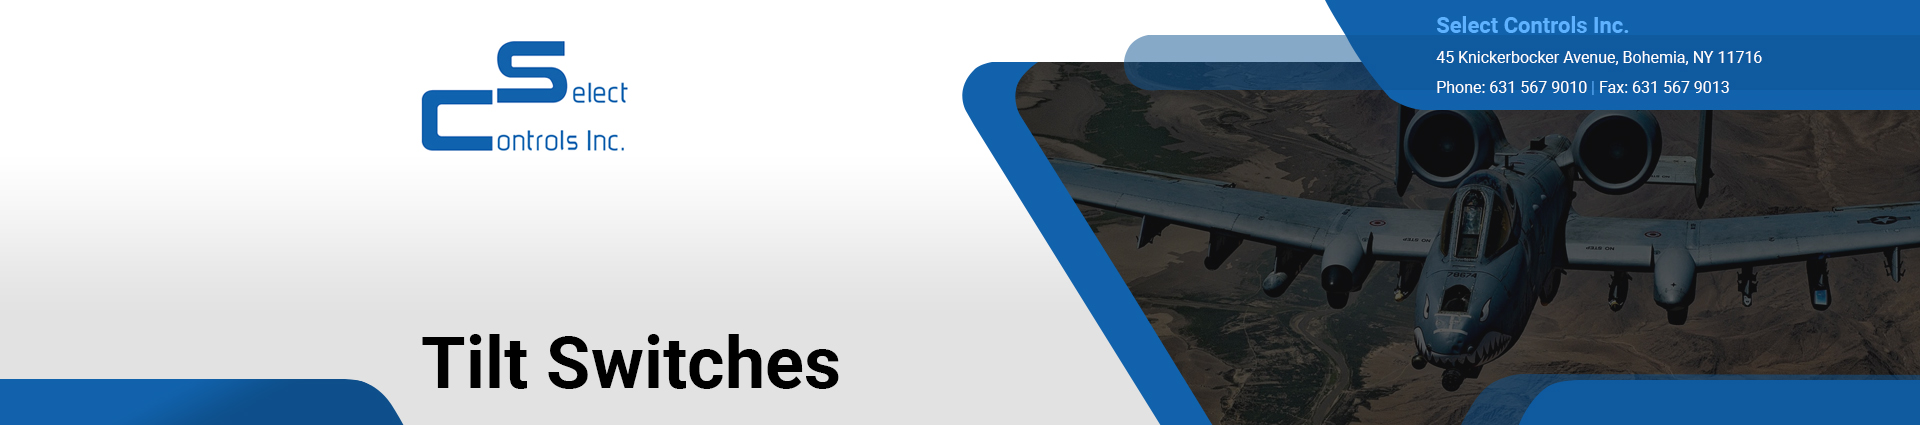 tilt-switches banner Select Controls Inc